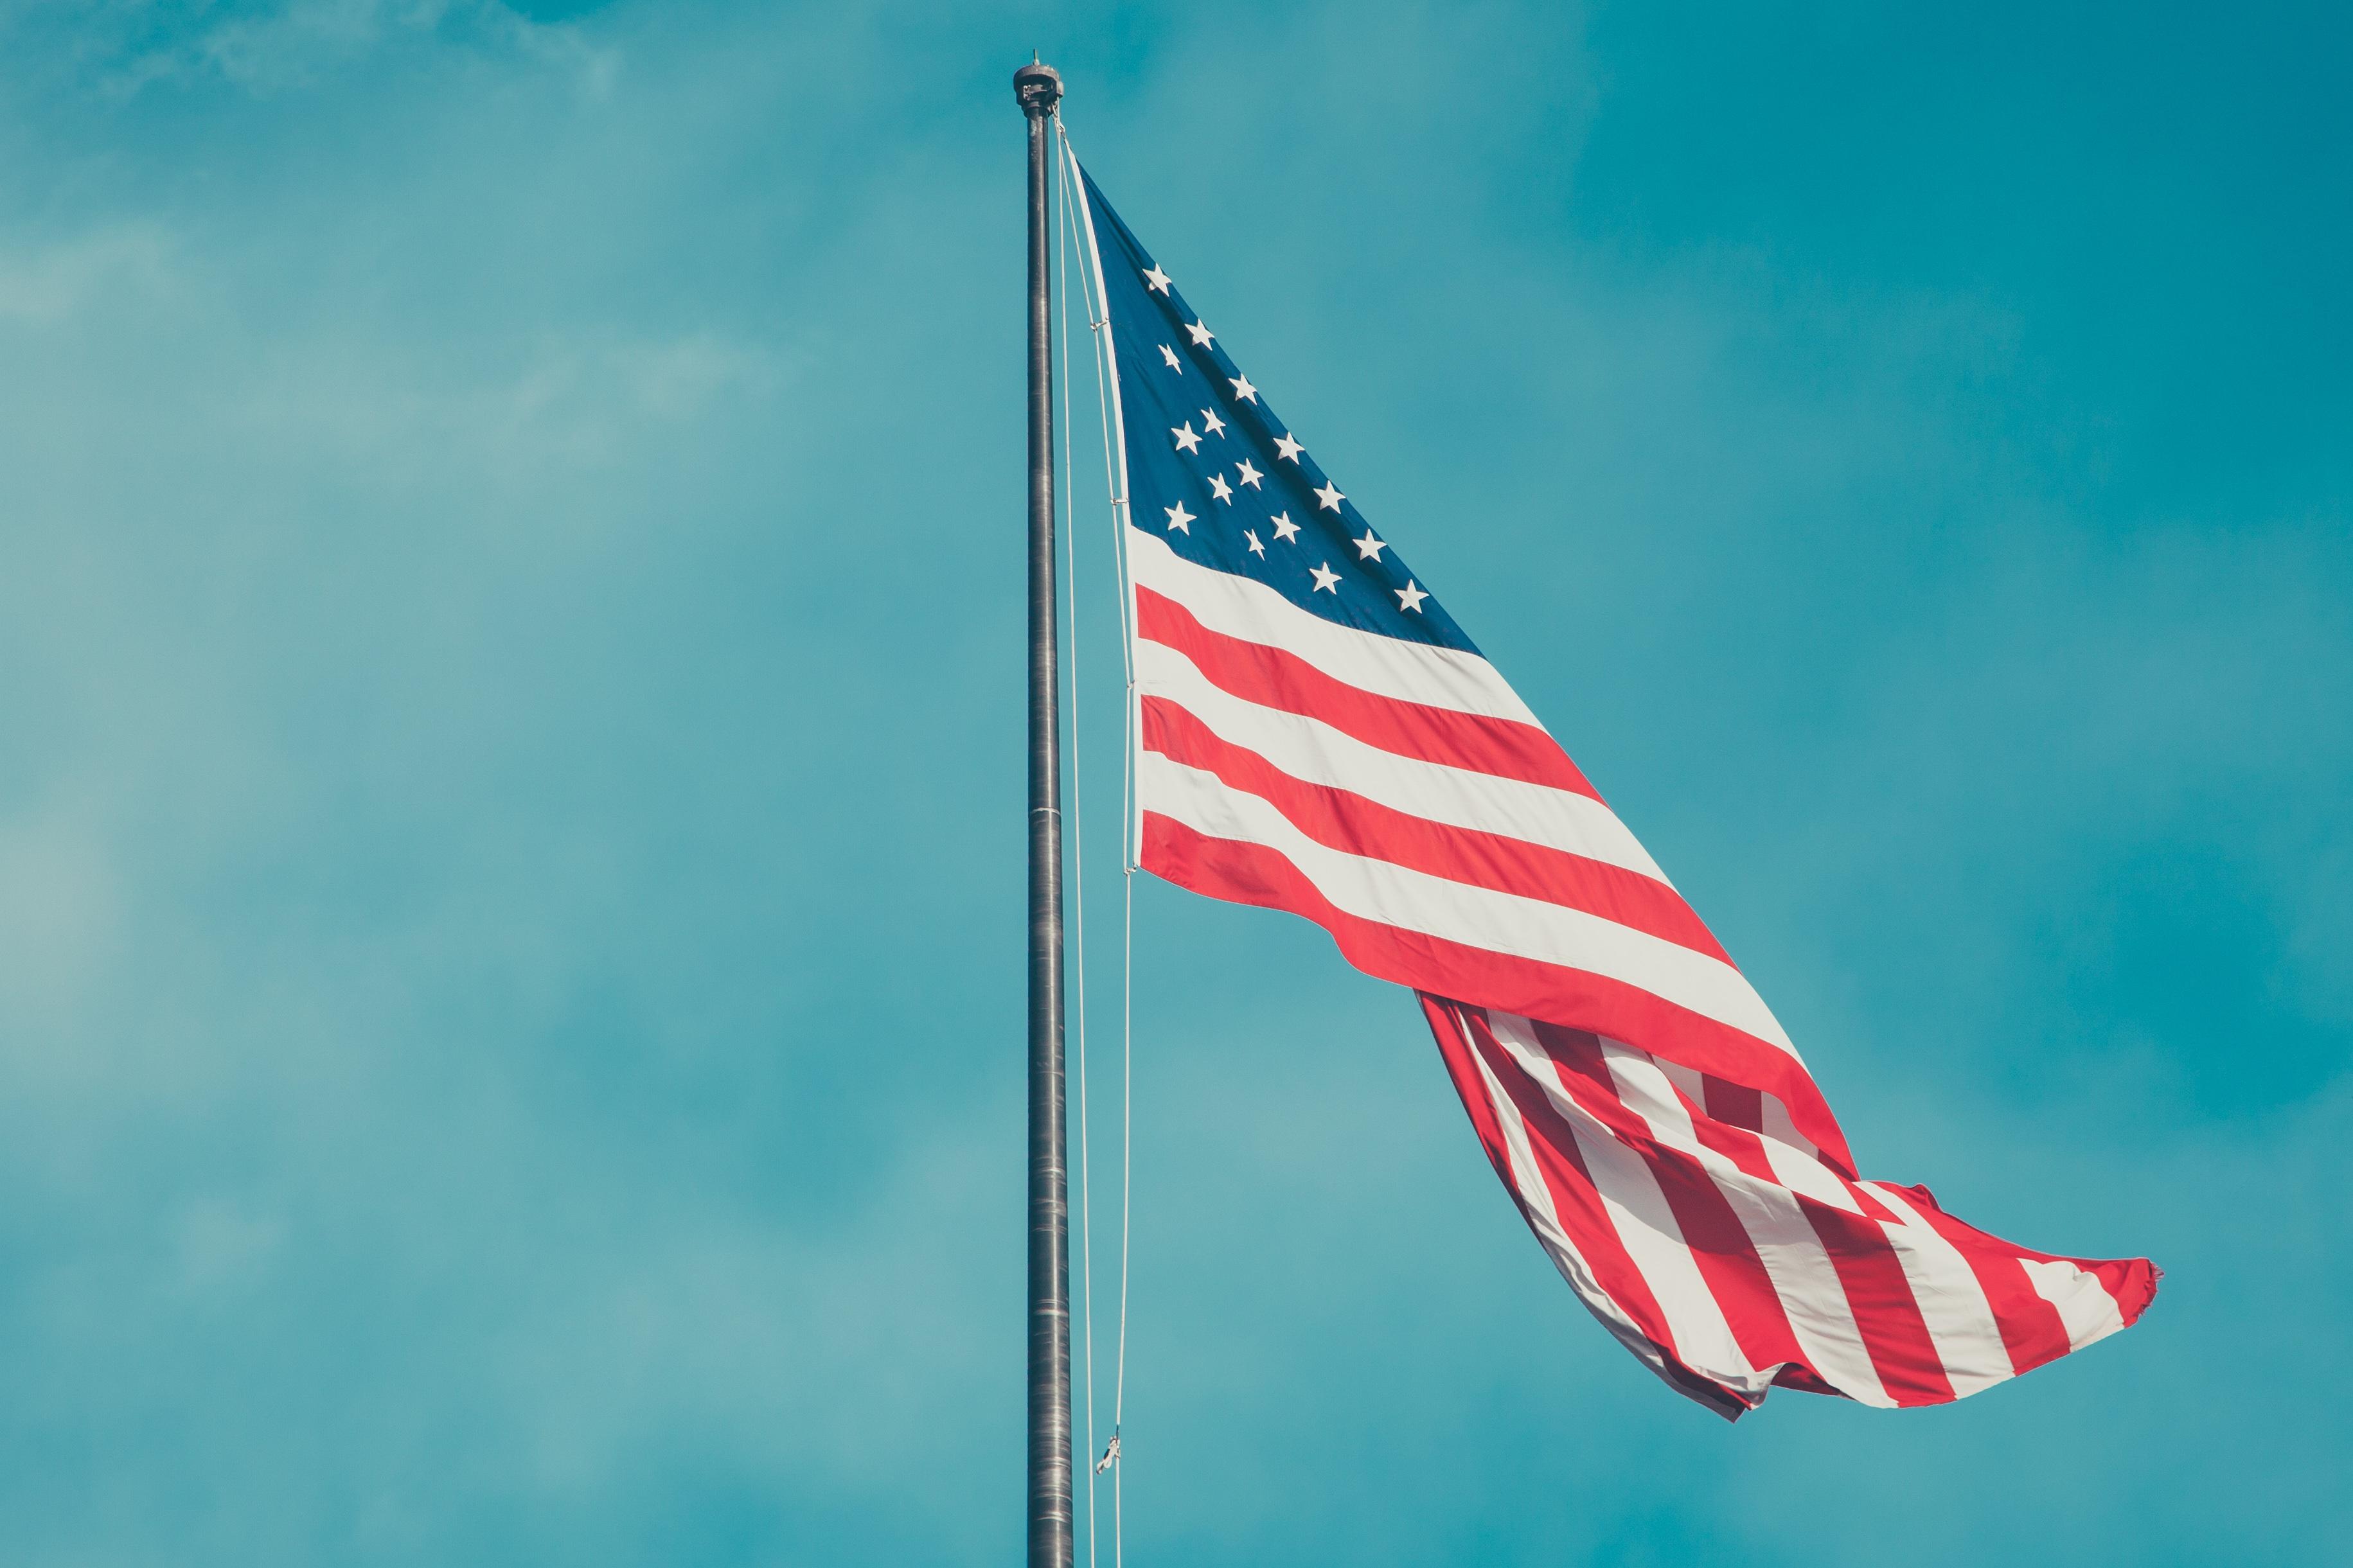 American-flag-blue-sky